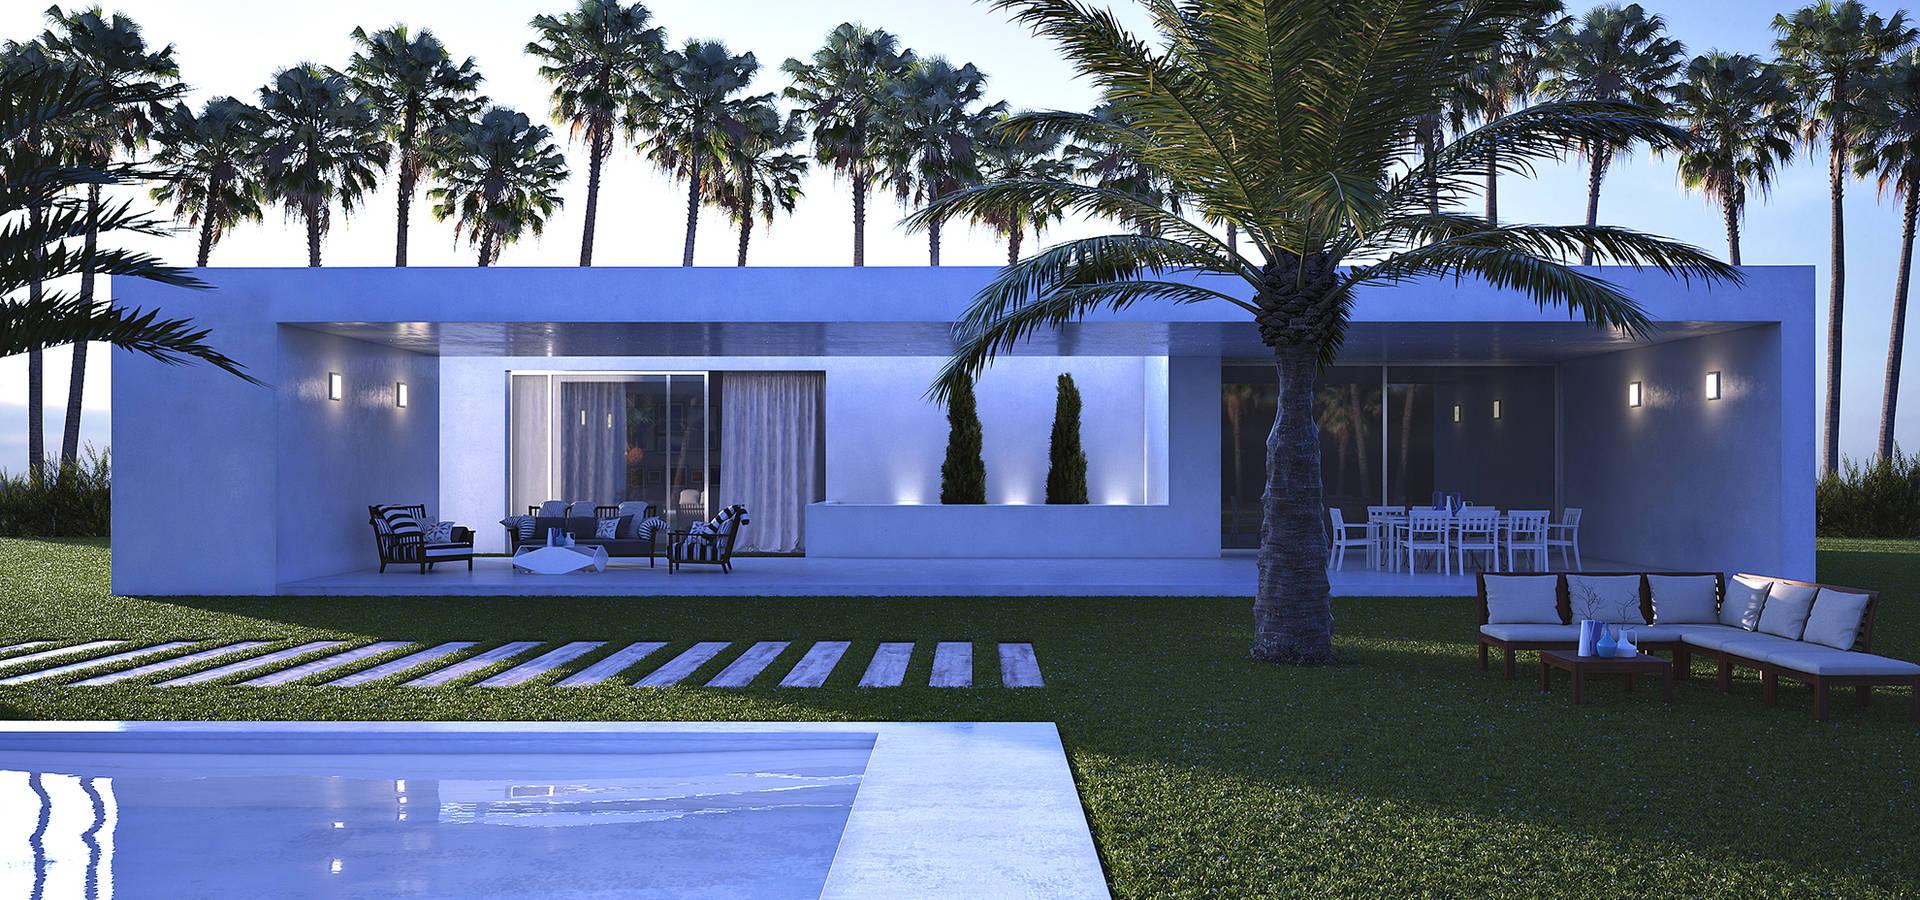 Maison Plus Construcciones sostenibles S.C.P,